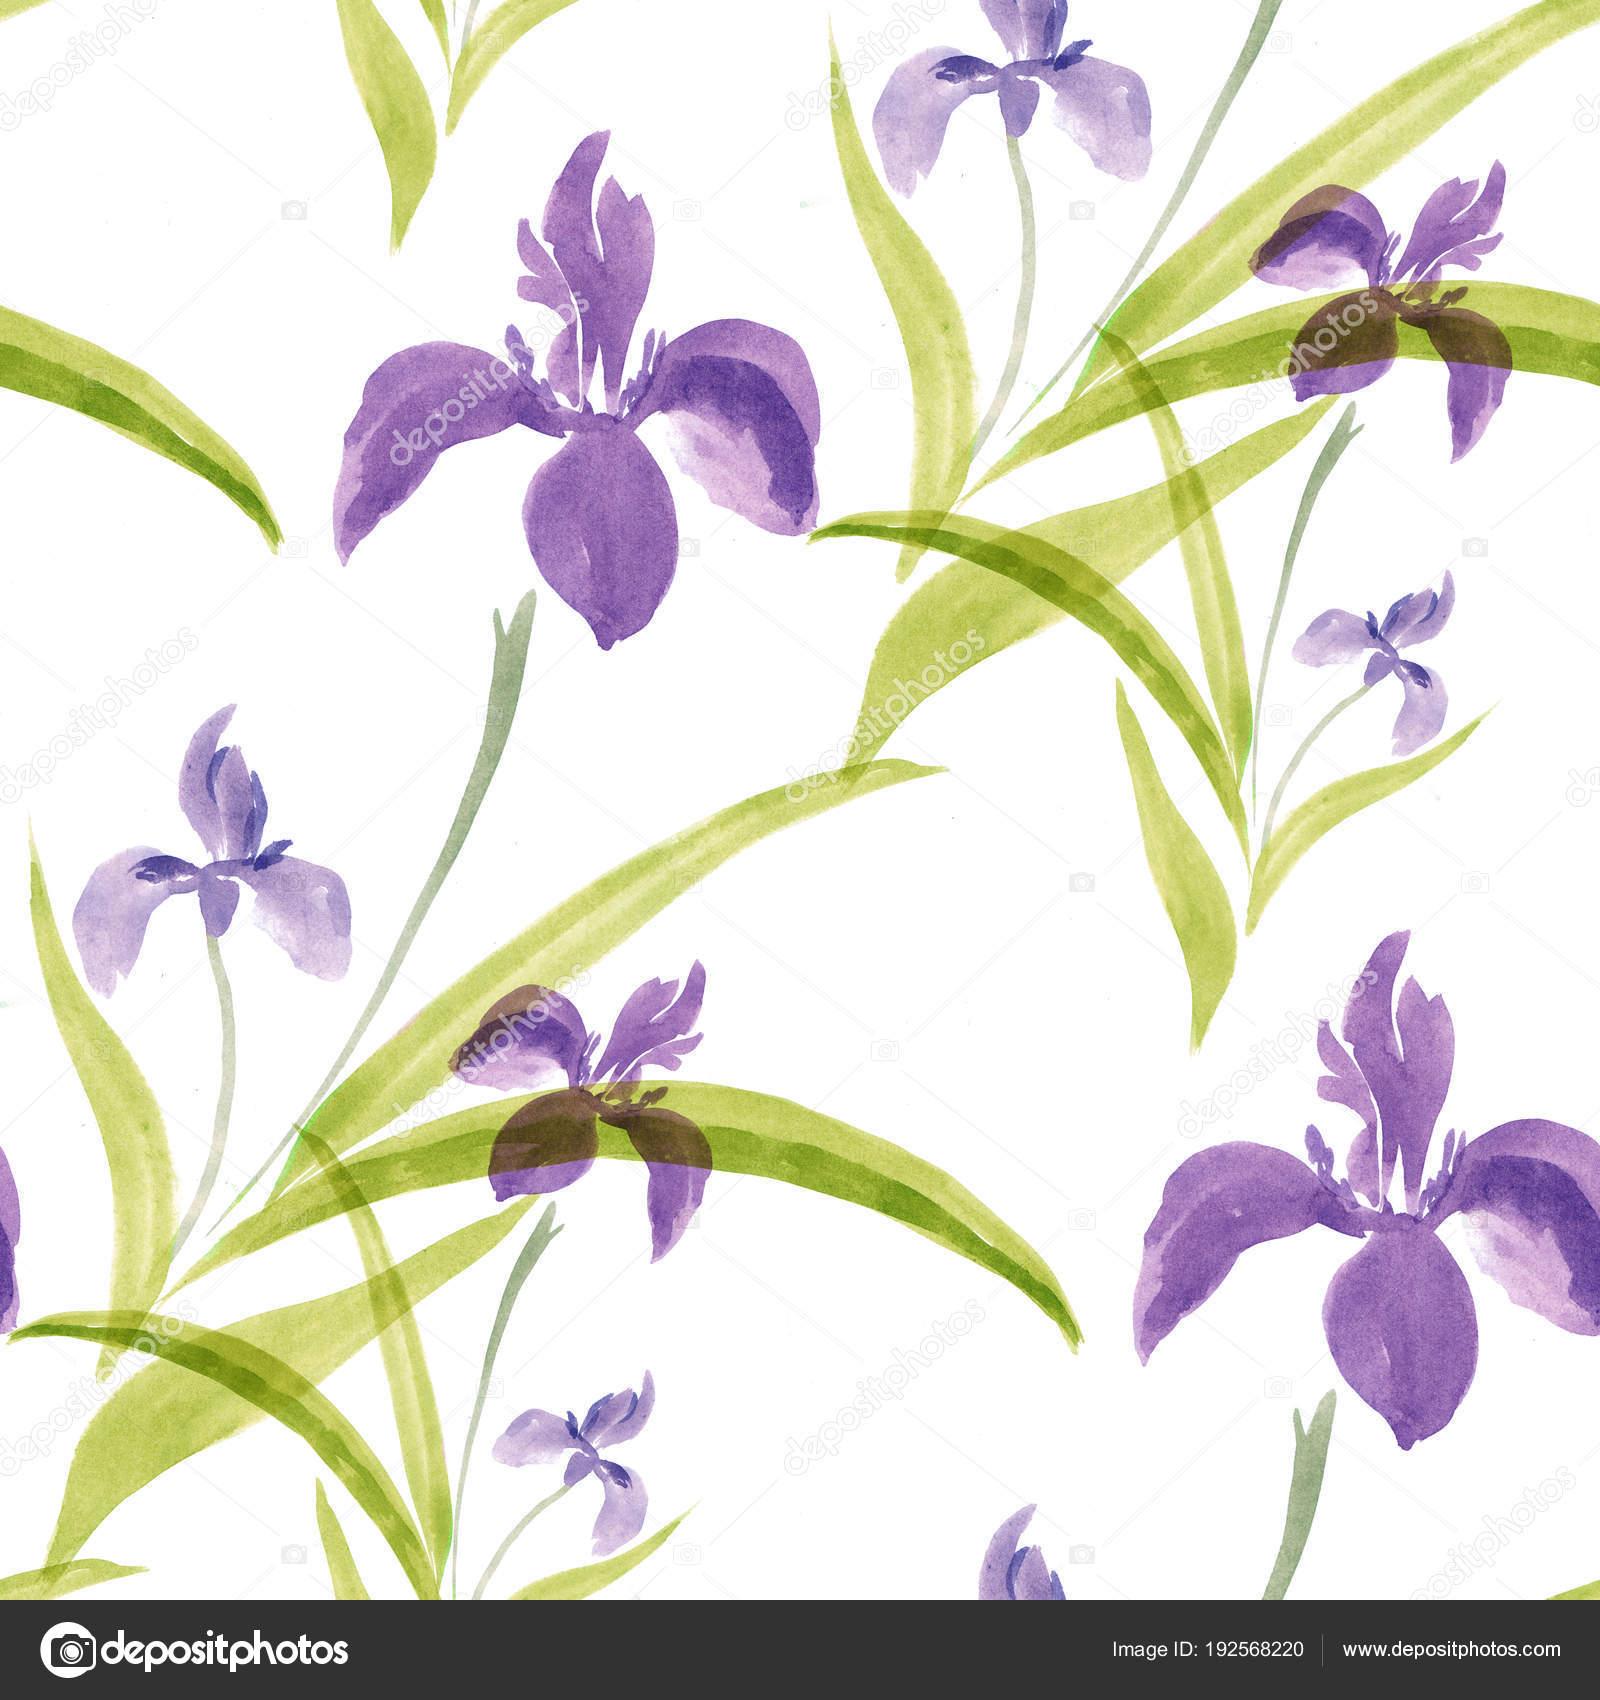 Flowers of irises watercolor on a white background seamless flowers of irises watercolor on a white background seamless pattern watercolor painting wallpaper izmirmasajfo